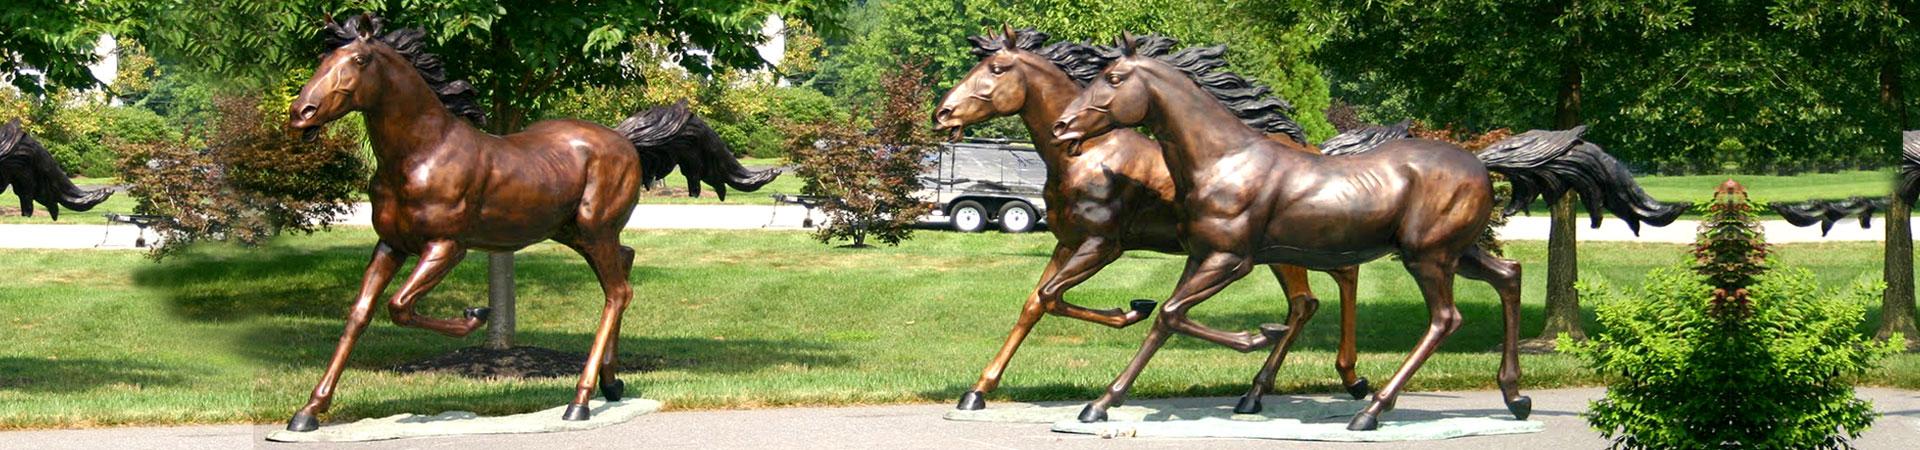 Bronze Horse Statues|bronze horses|horse Sculptures|horse Figurines ...